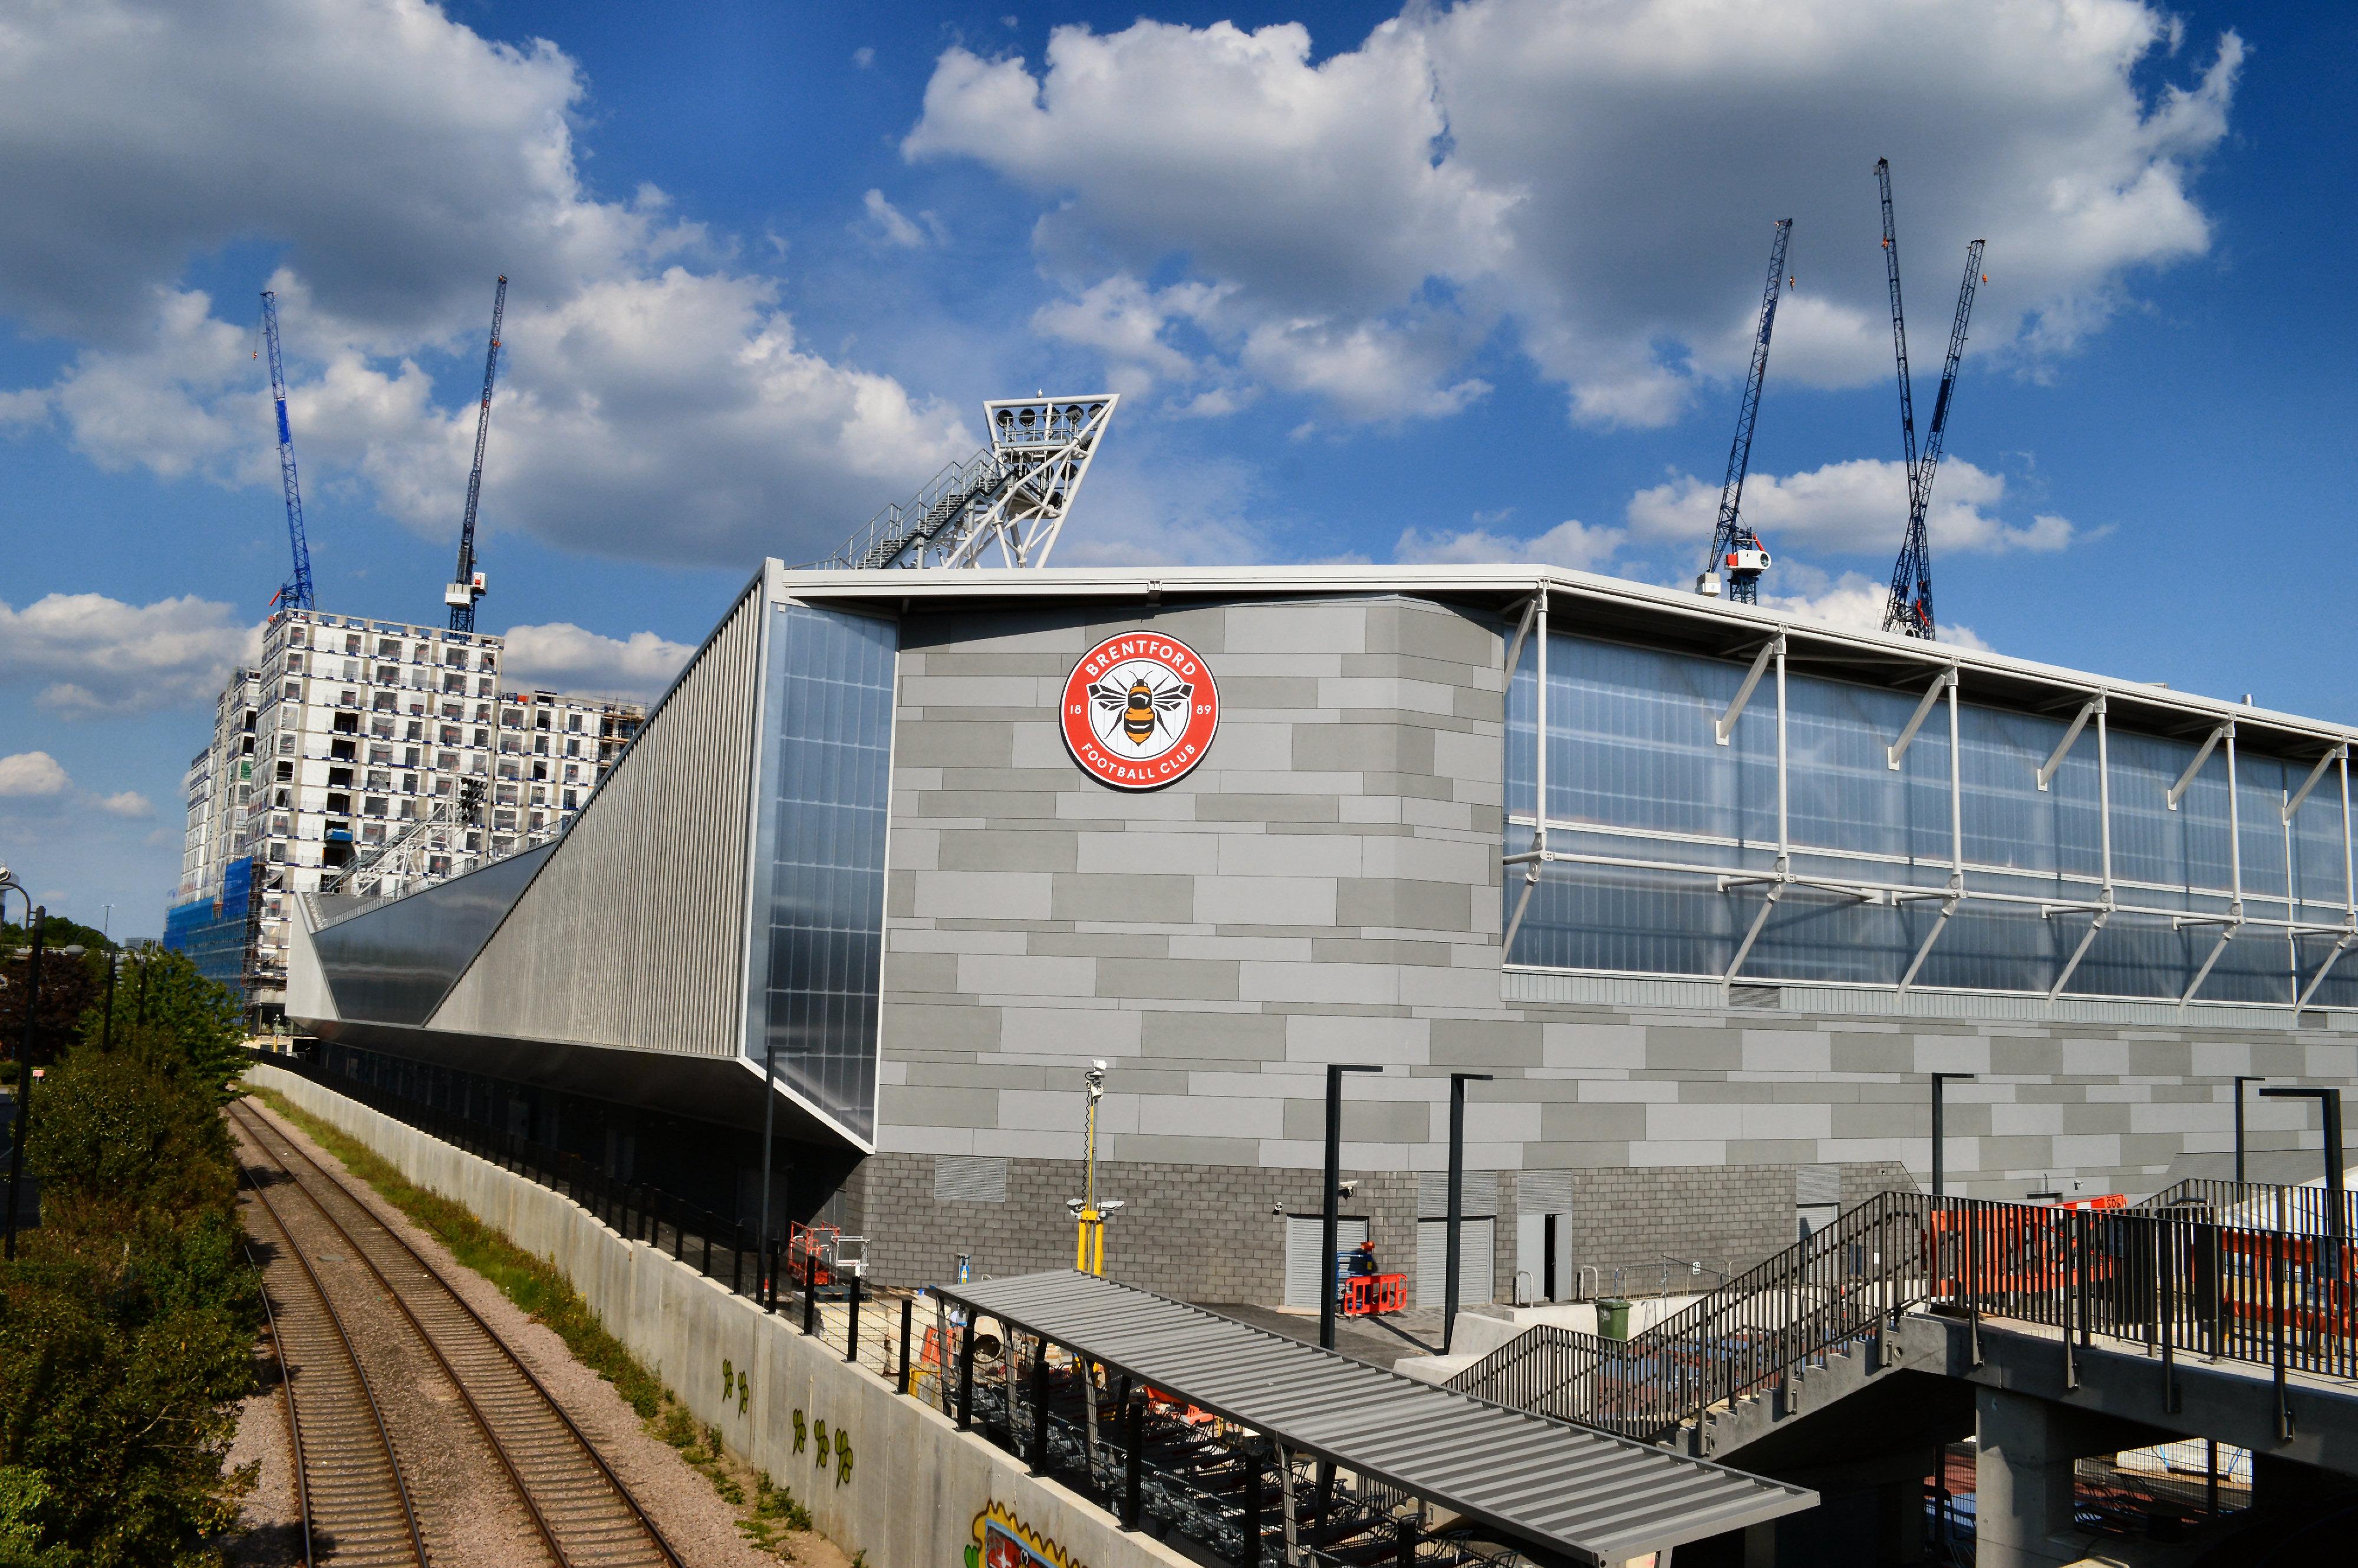 2021–22 Brentford F.C. season - Wikipedia